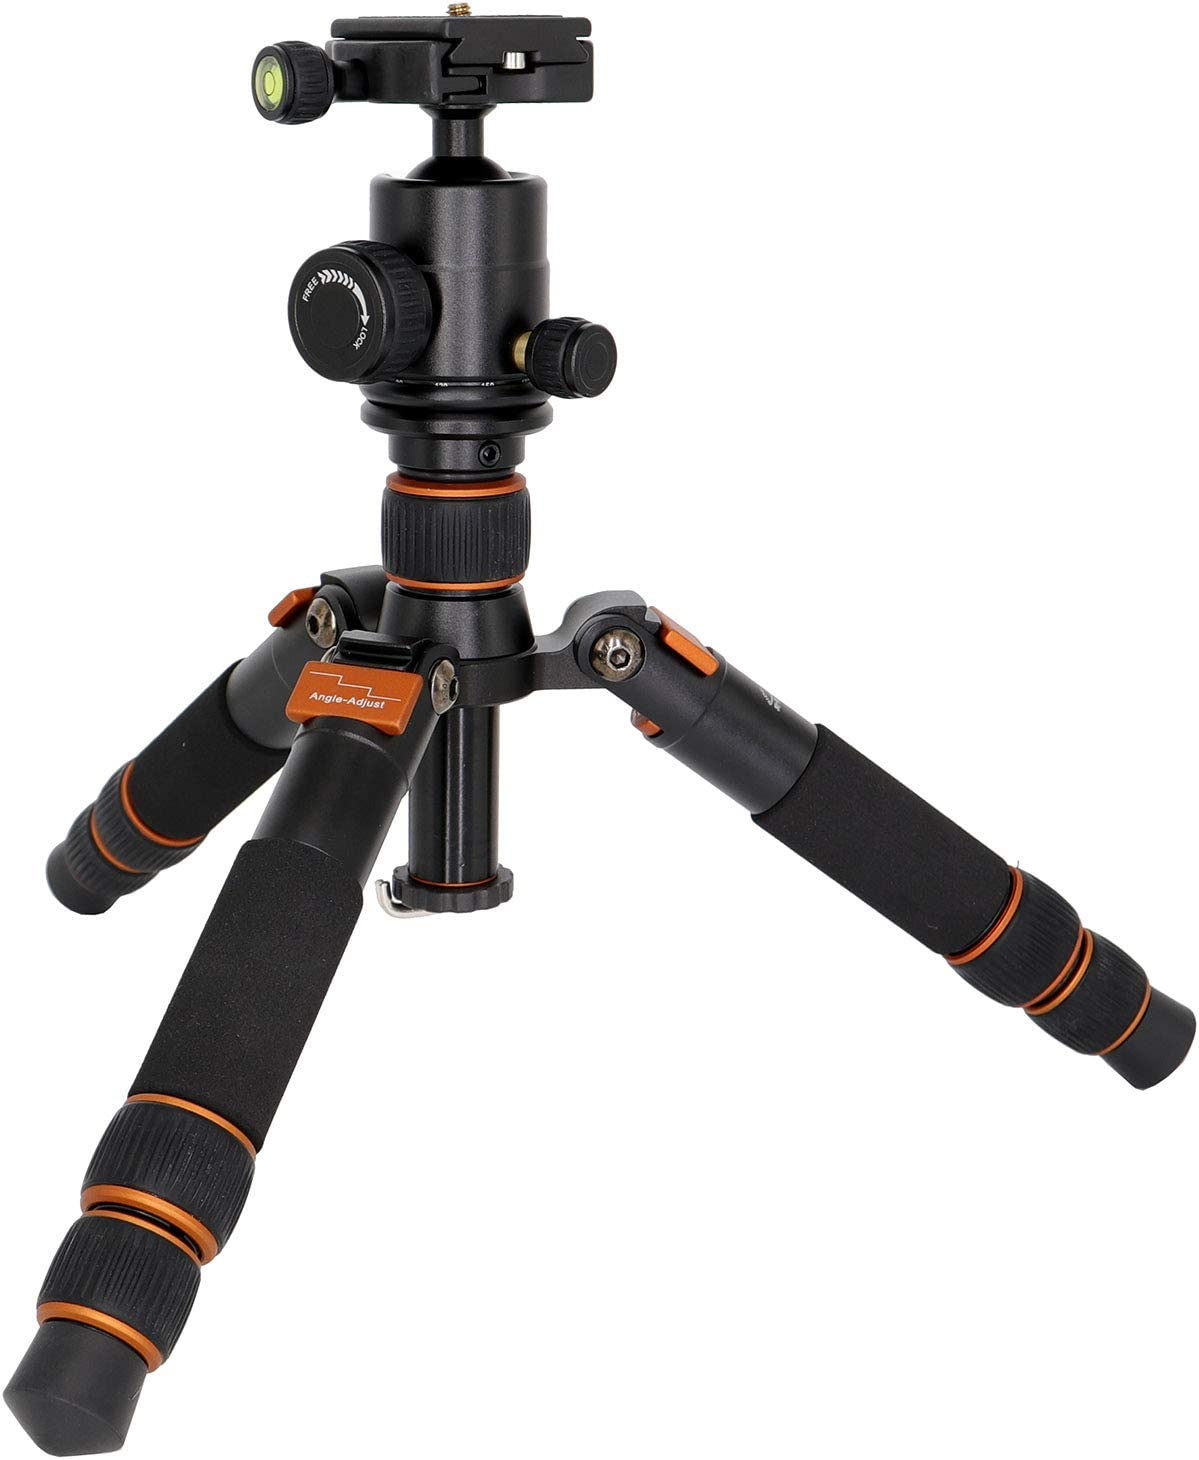 Koolehaoda 55-inch Lightweight Camera Tripod Monopod with Ballhead for DSLR Camera only 1.12KG//2.46 pounds. KQ-999 Lightweight